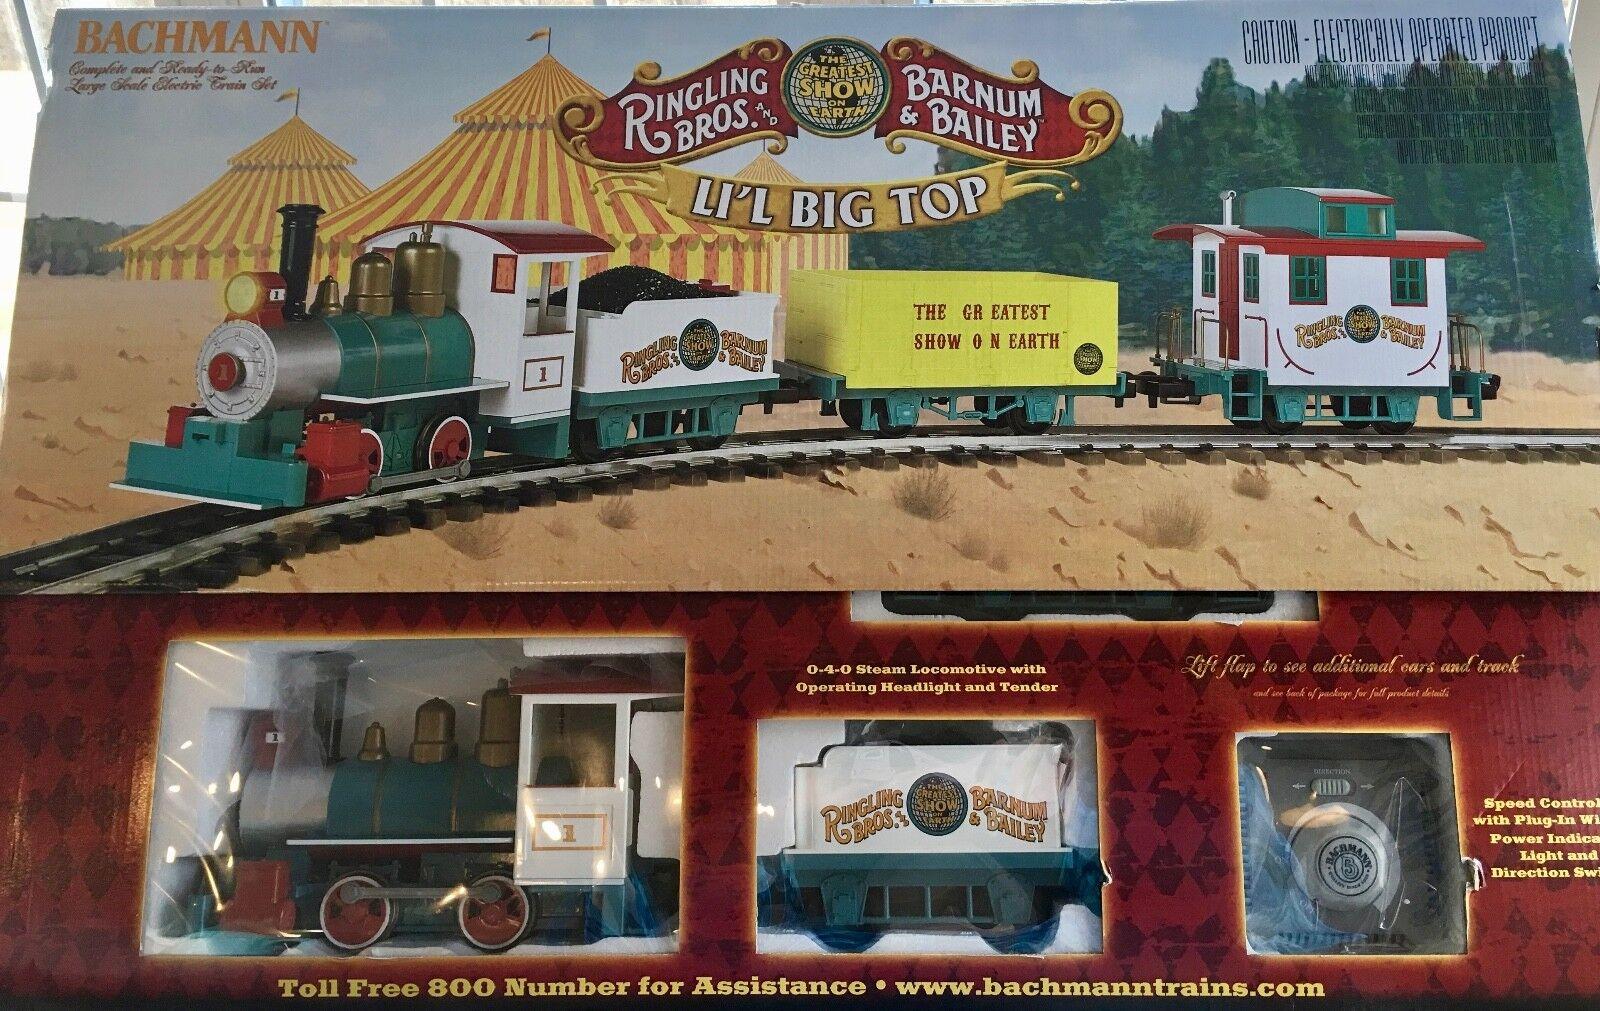 New Bachmann RINGLING BROS & Barnum Bailey Li'l Big Top Circus Train-ship free